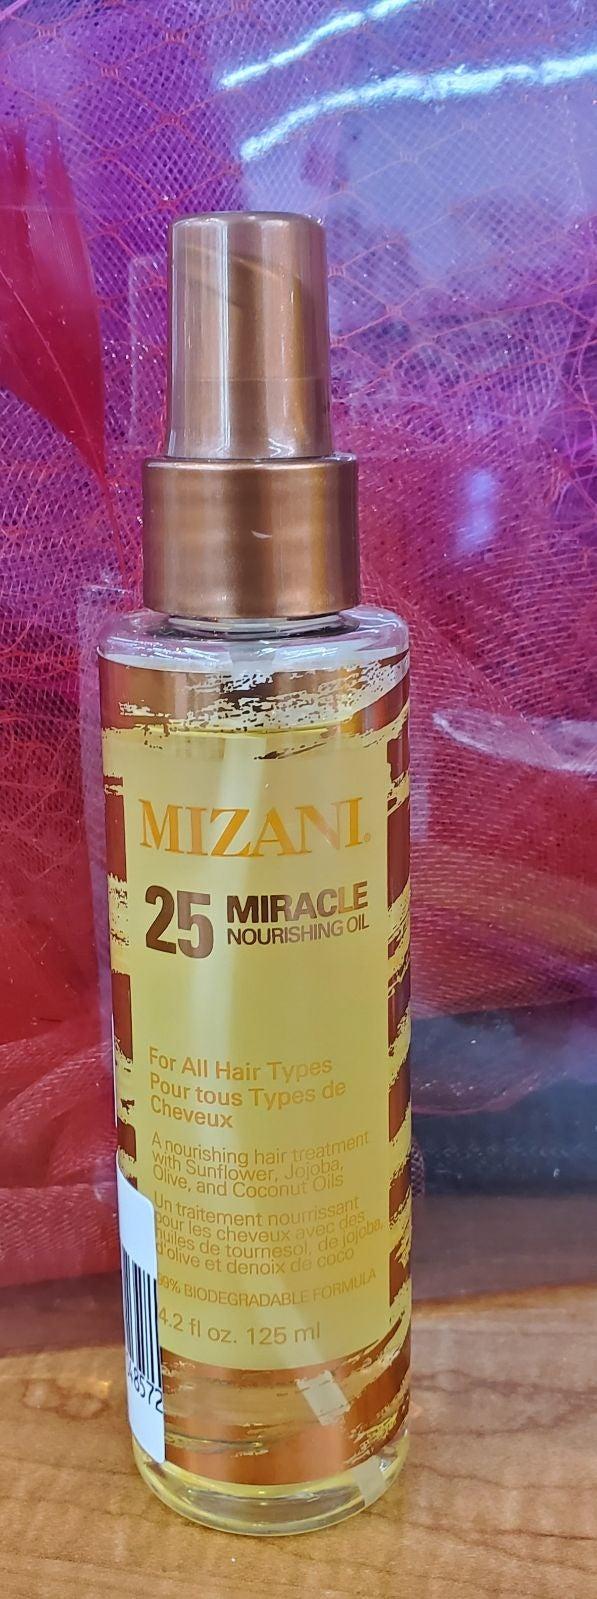 Mizani 25 Miracle Nourishing Hair Oil -